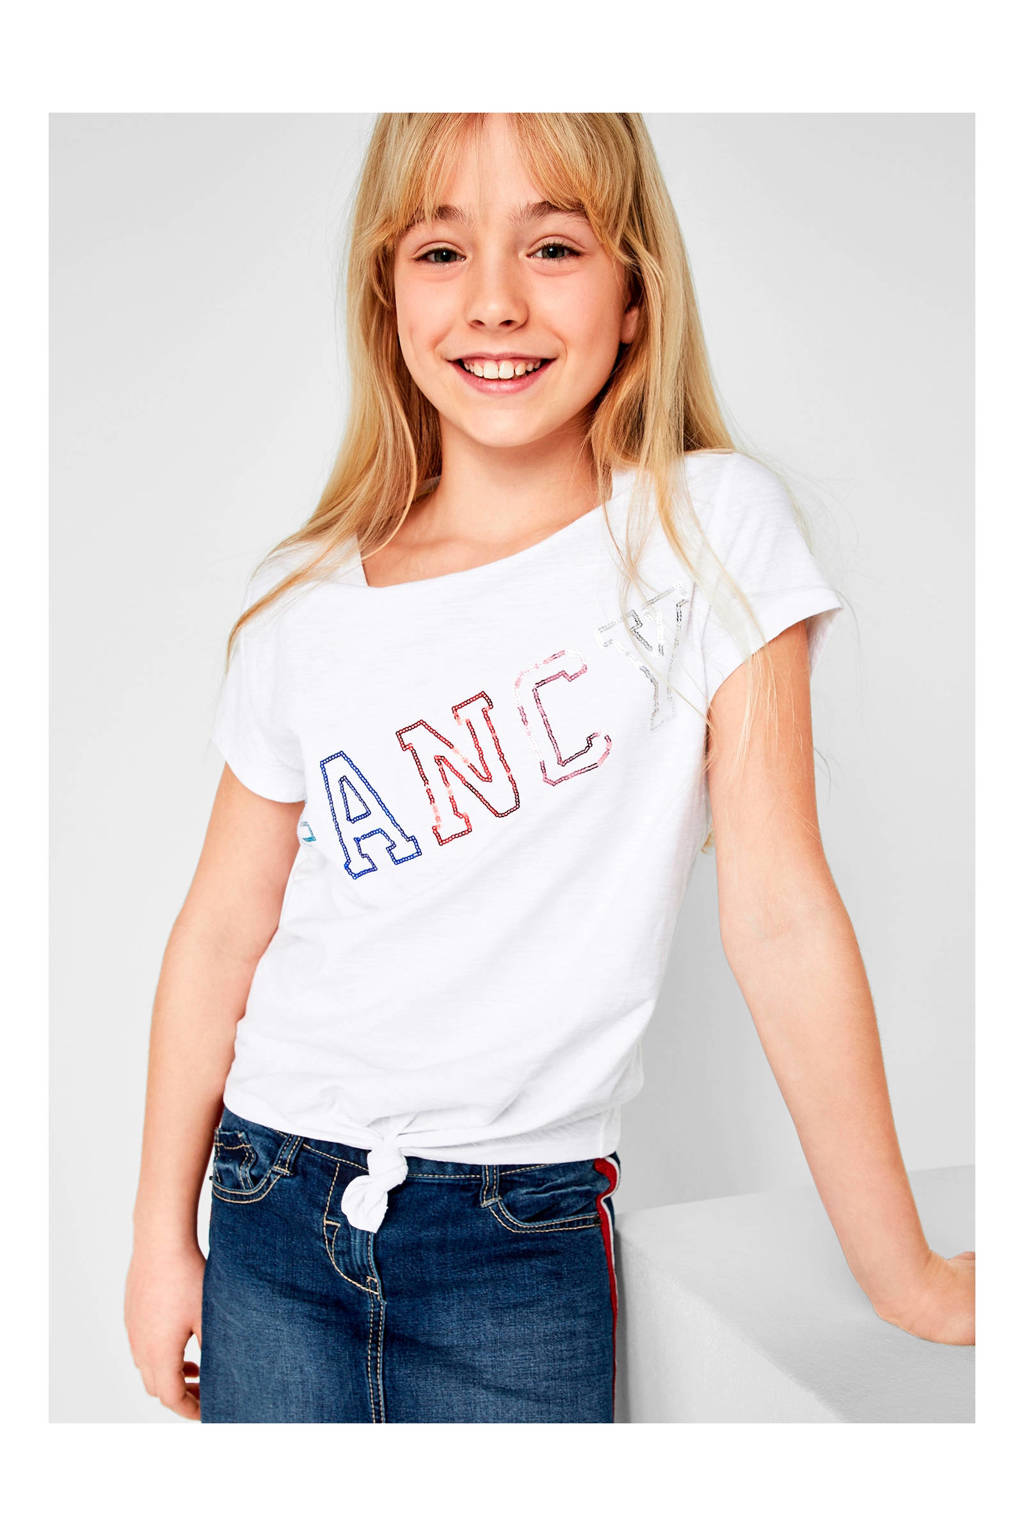 goed uit x koop uitverkoop laagste korting s.Oliver T-shirt met knoop en tekst wit | wehkamp